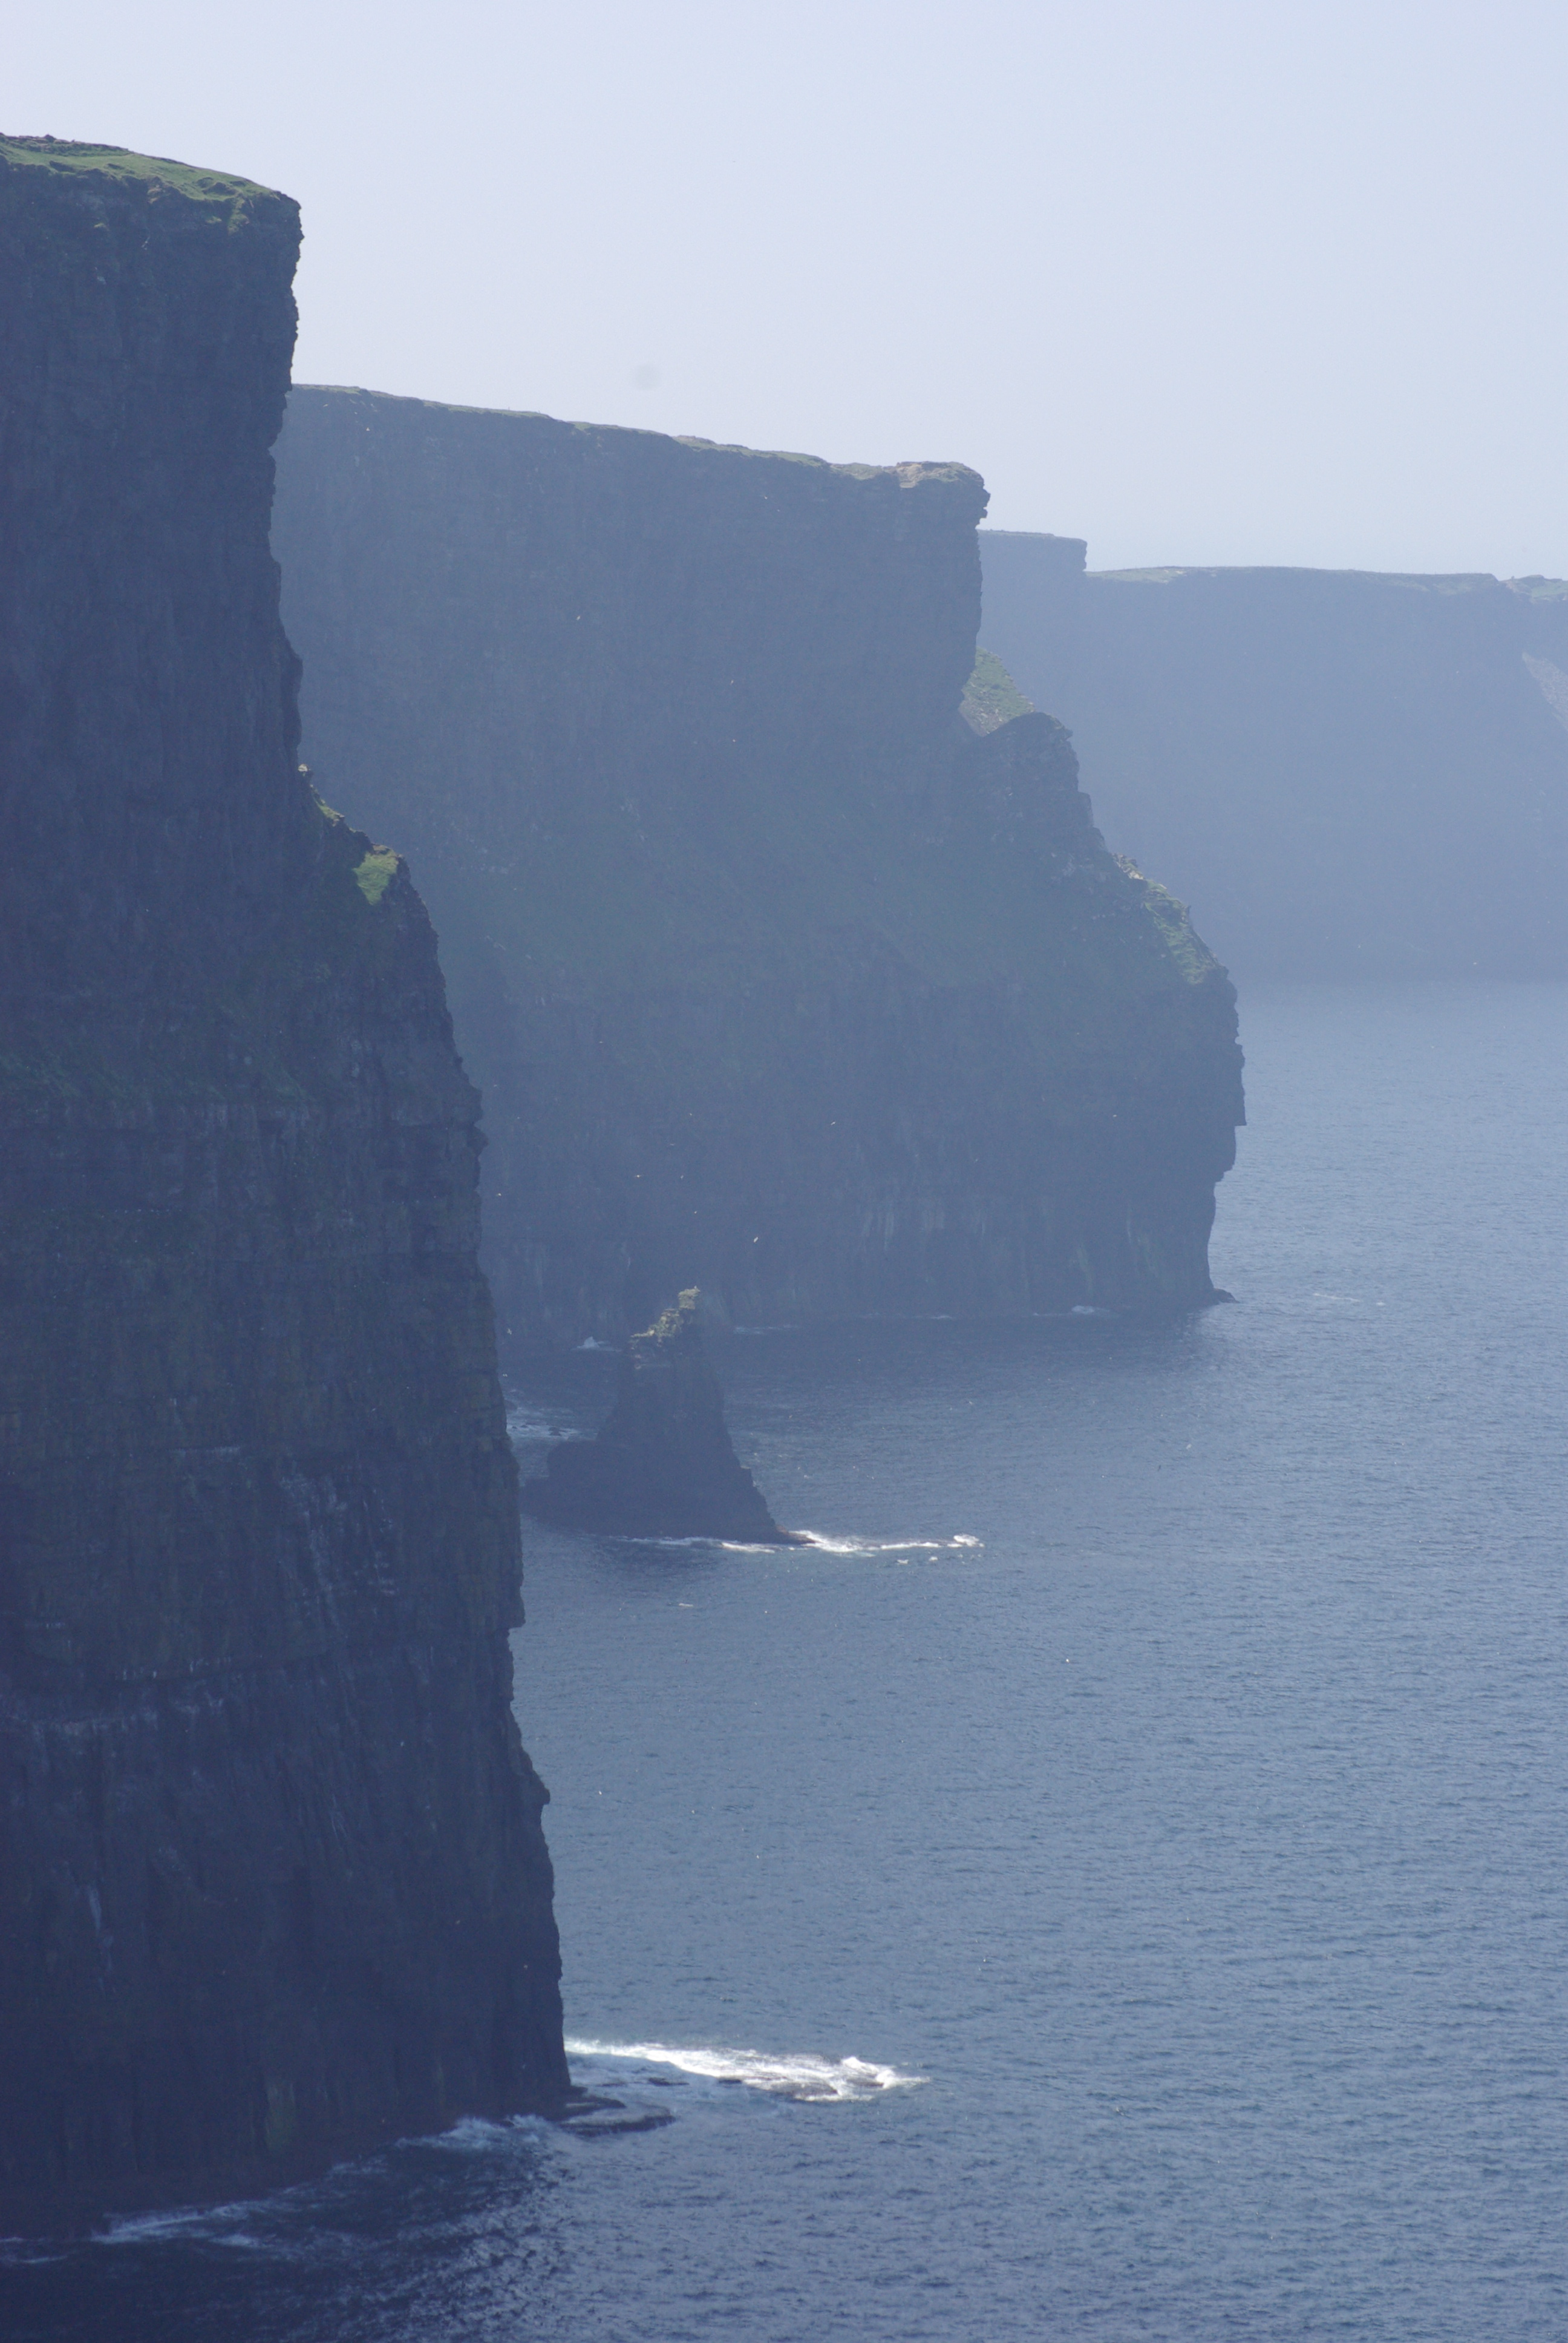 Cliffs of Mohar Ireland, Bare, Cliffs, Harsh, Ireland, HQ Photo